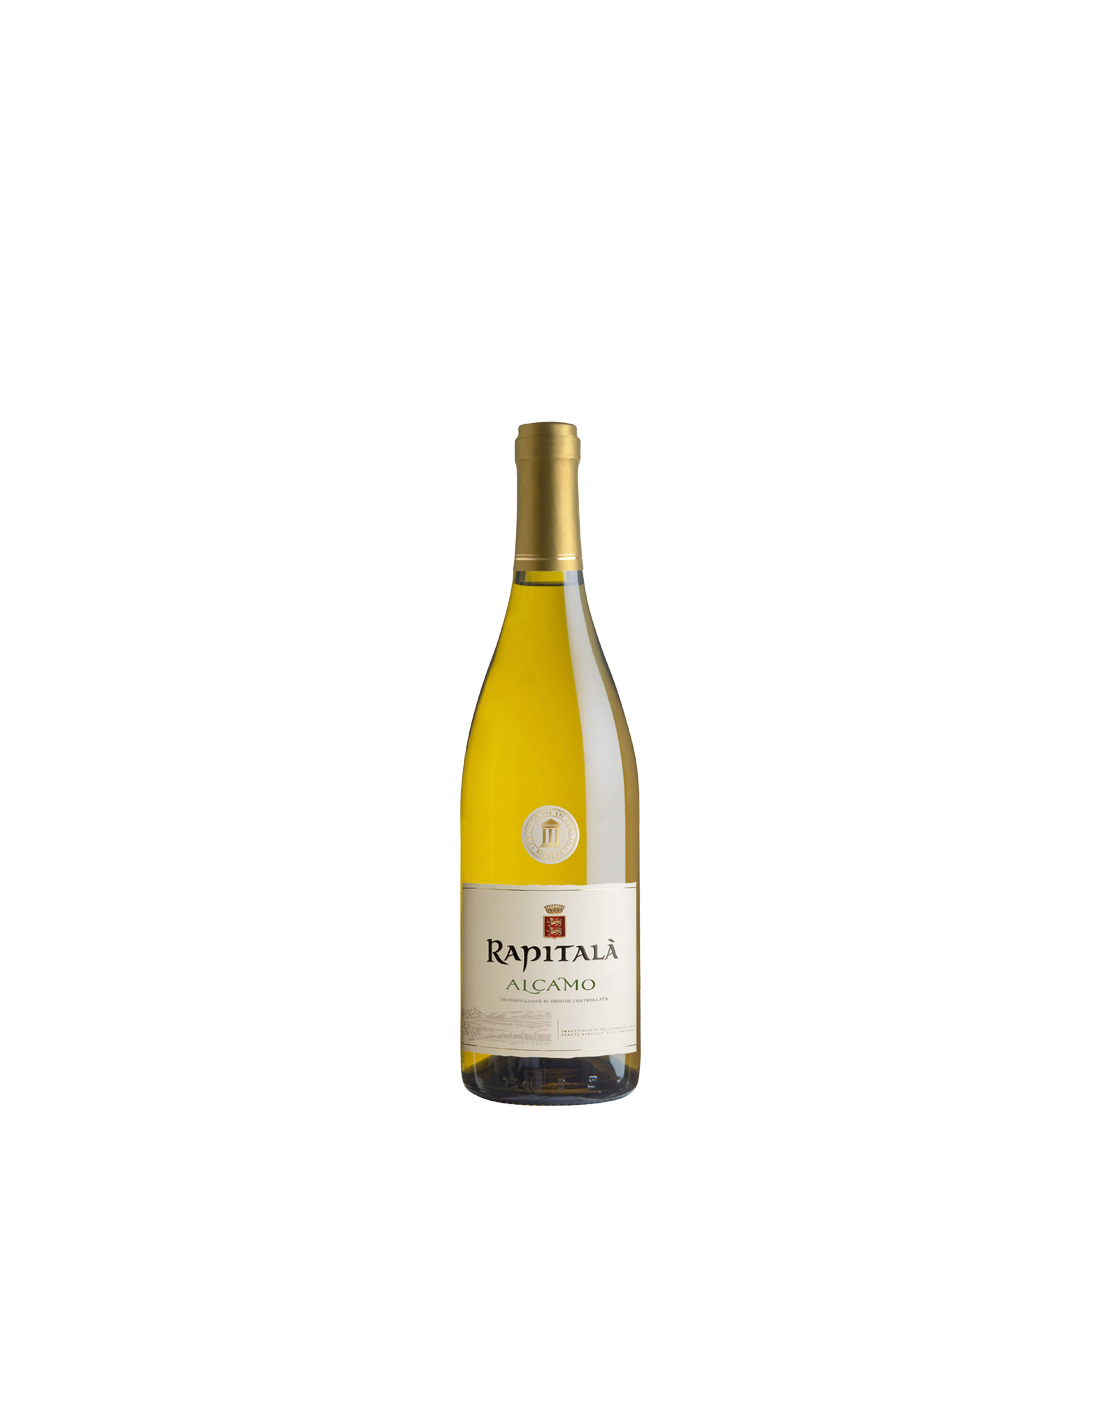 Vin alb, Tenuta Rapitala Alcamo, 12% alc., 0.75L, Italia